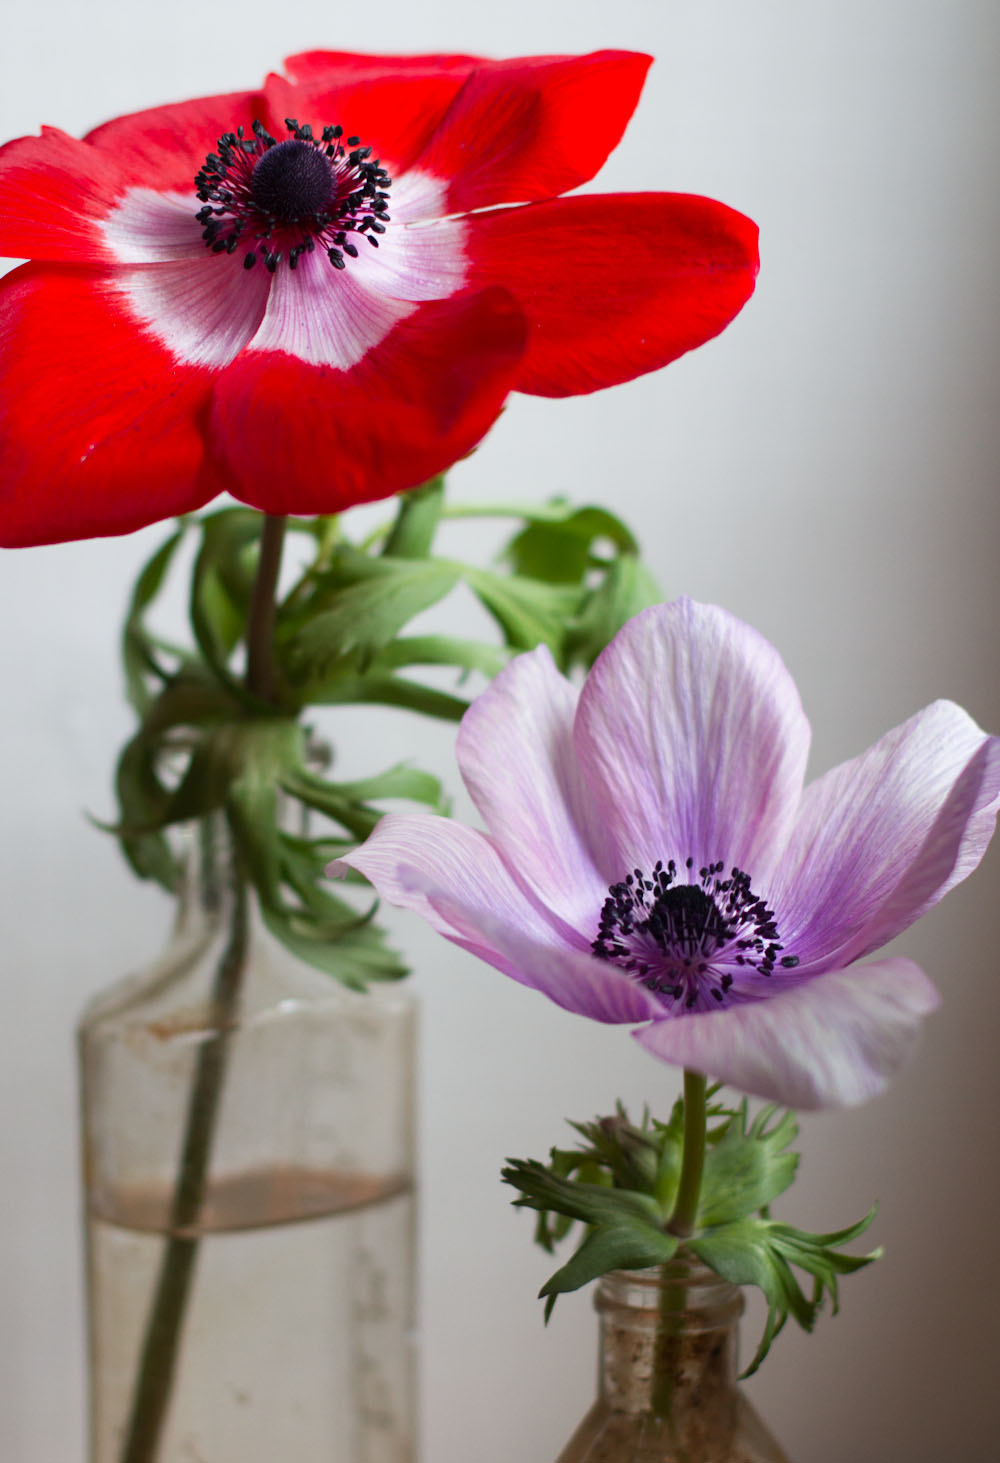 anemones from mandy.jpg